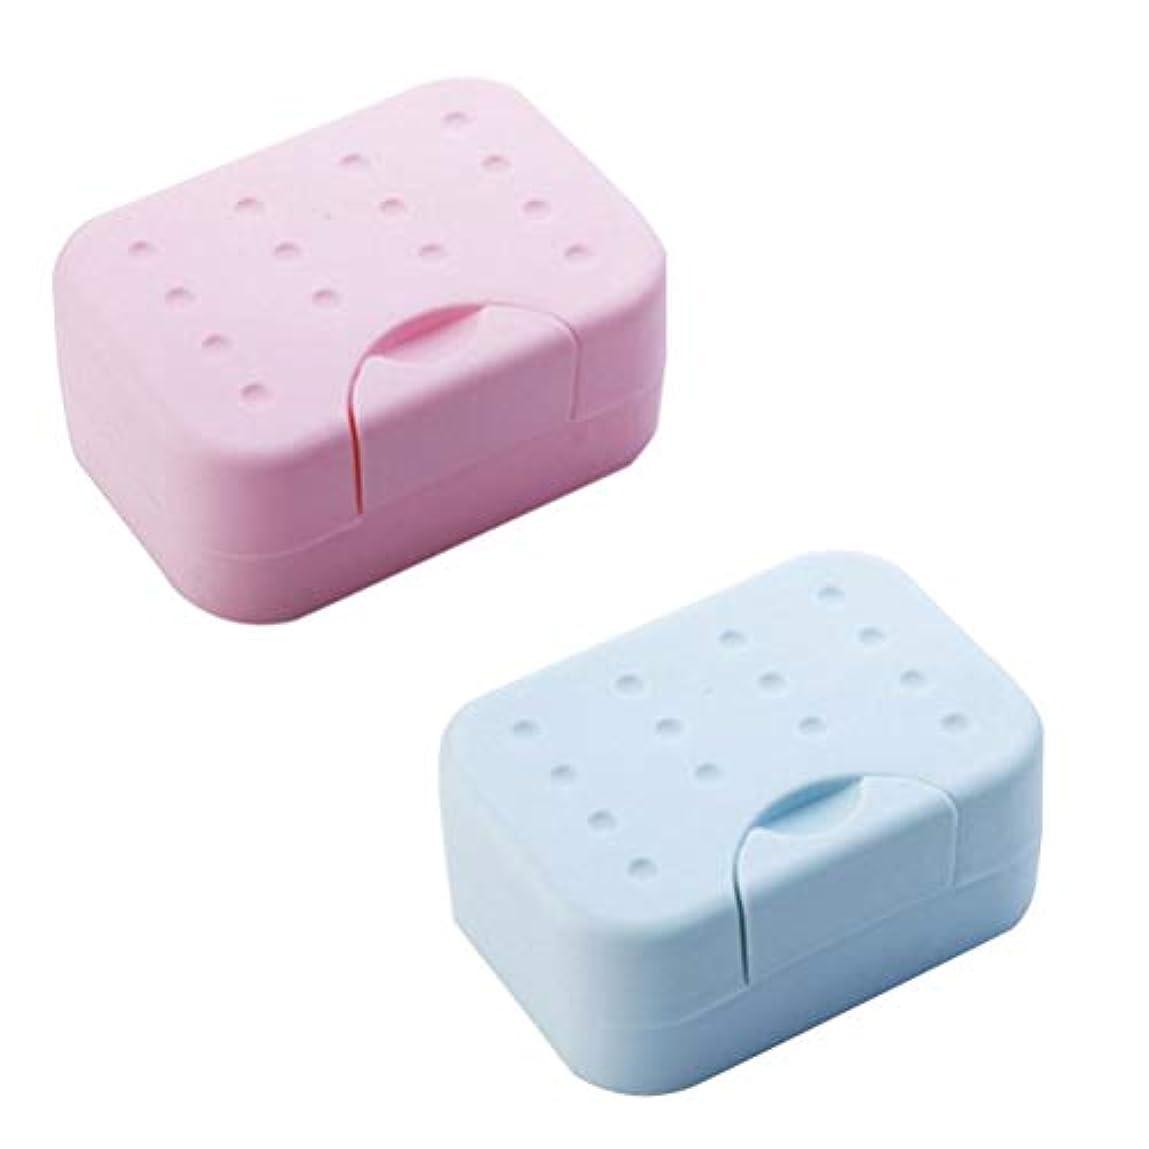 Healifty 2PC石鹸容器旅行石鹸ボックス石けんケース耐久性プラスチック防水飲料水スポンジ石鹸キャビネットのための食器ホルダーホームバスルーム(赤と青)